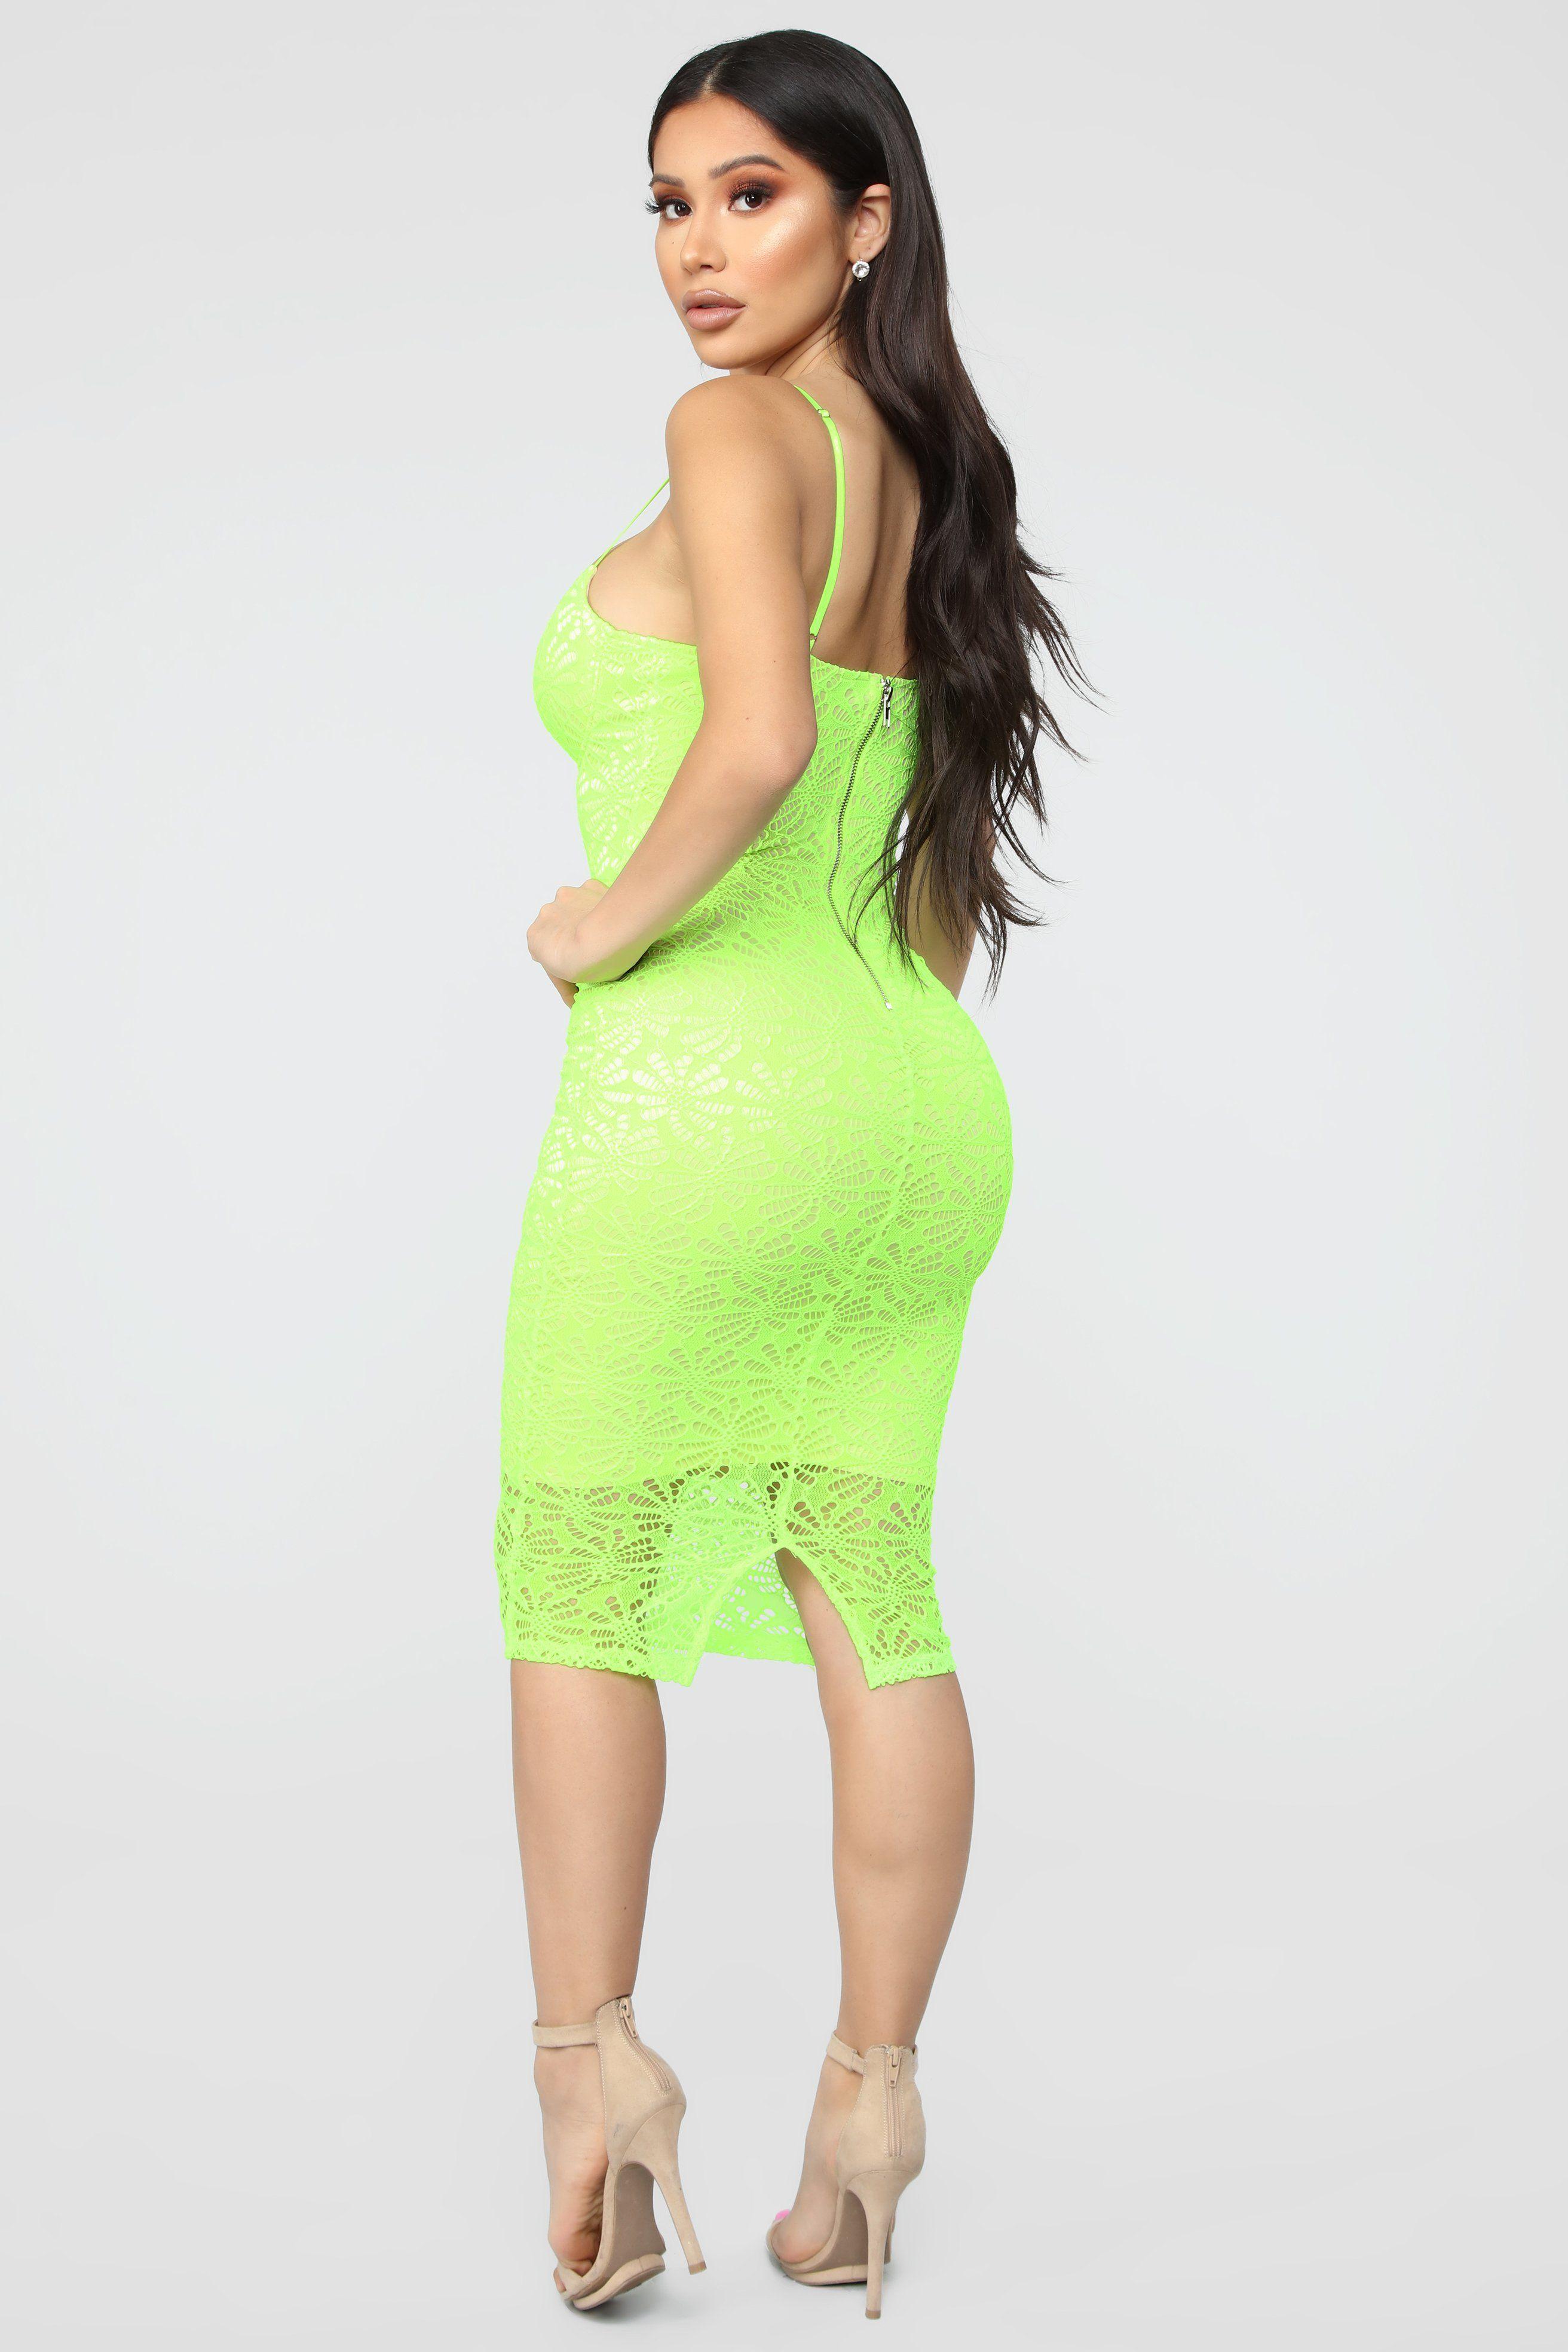 Rumor And Gossip Lace Dress Neon Yellow in 2020 Neon